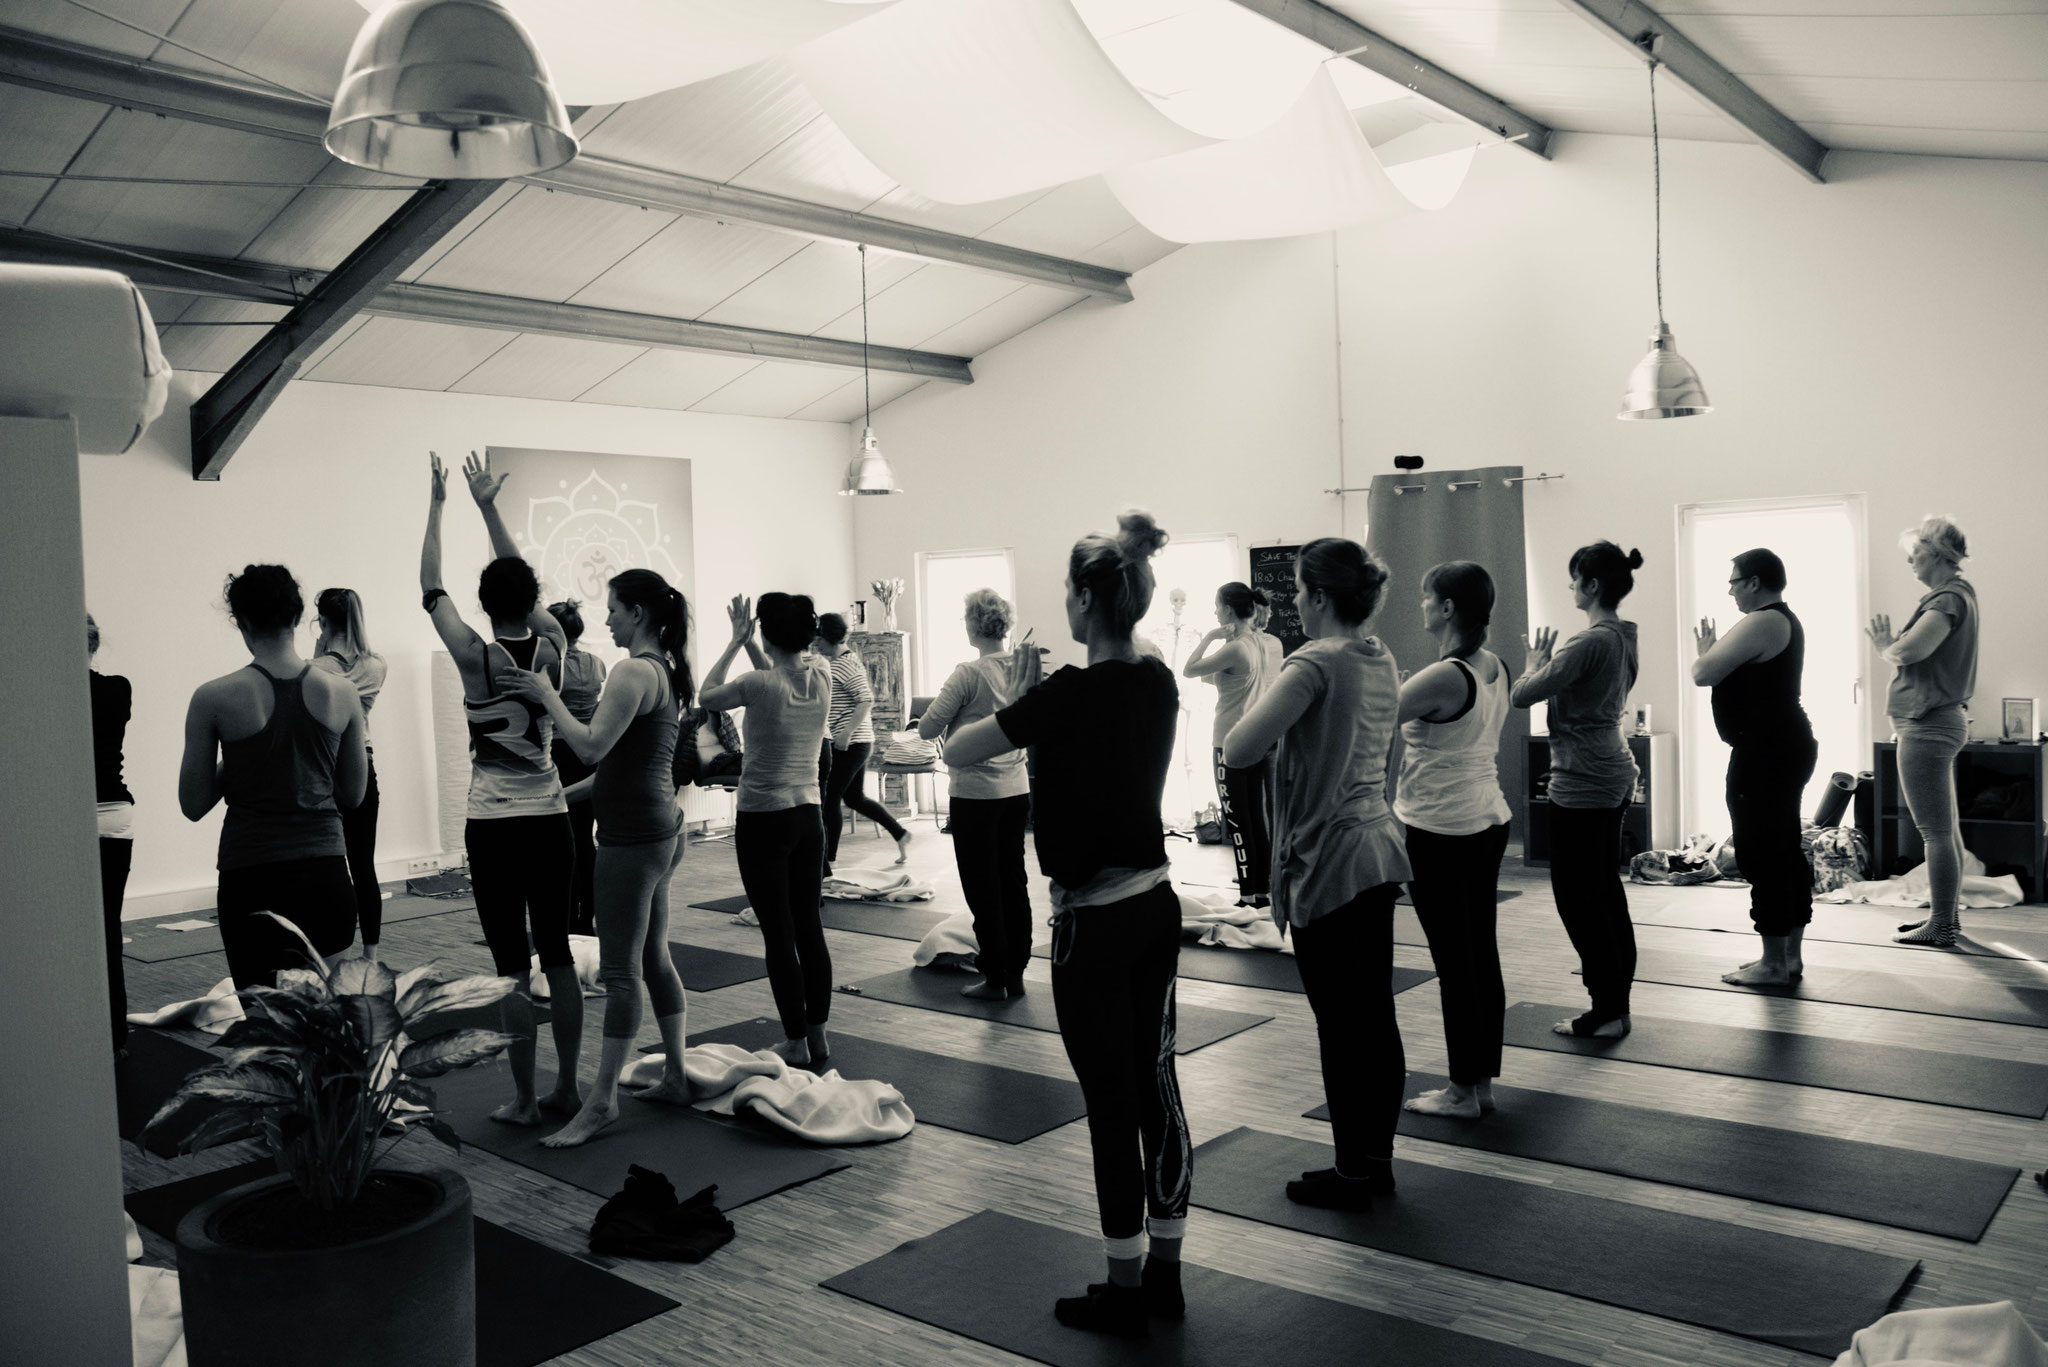 Hatha Yogakurs bei Yamida - Yogaschule  Yoga Lüdinghausen, Datteln, Selm, Nordkirchen, Ascheberg, Cappenberg, Olfen, Senden